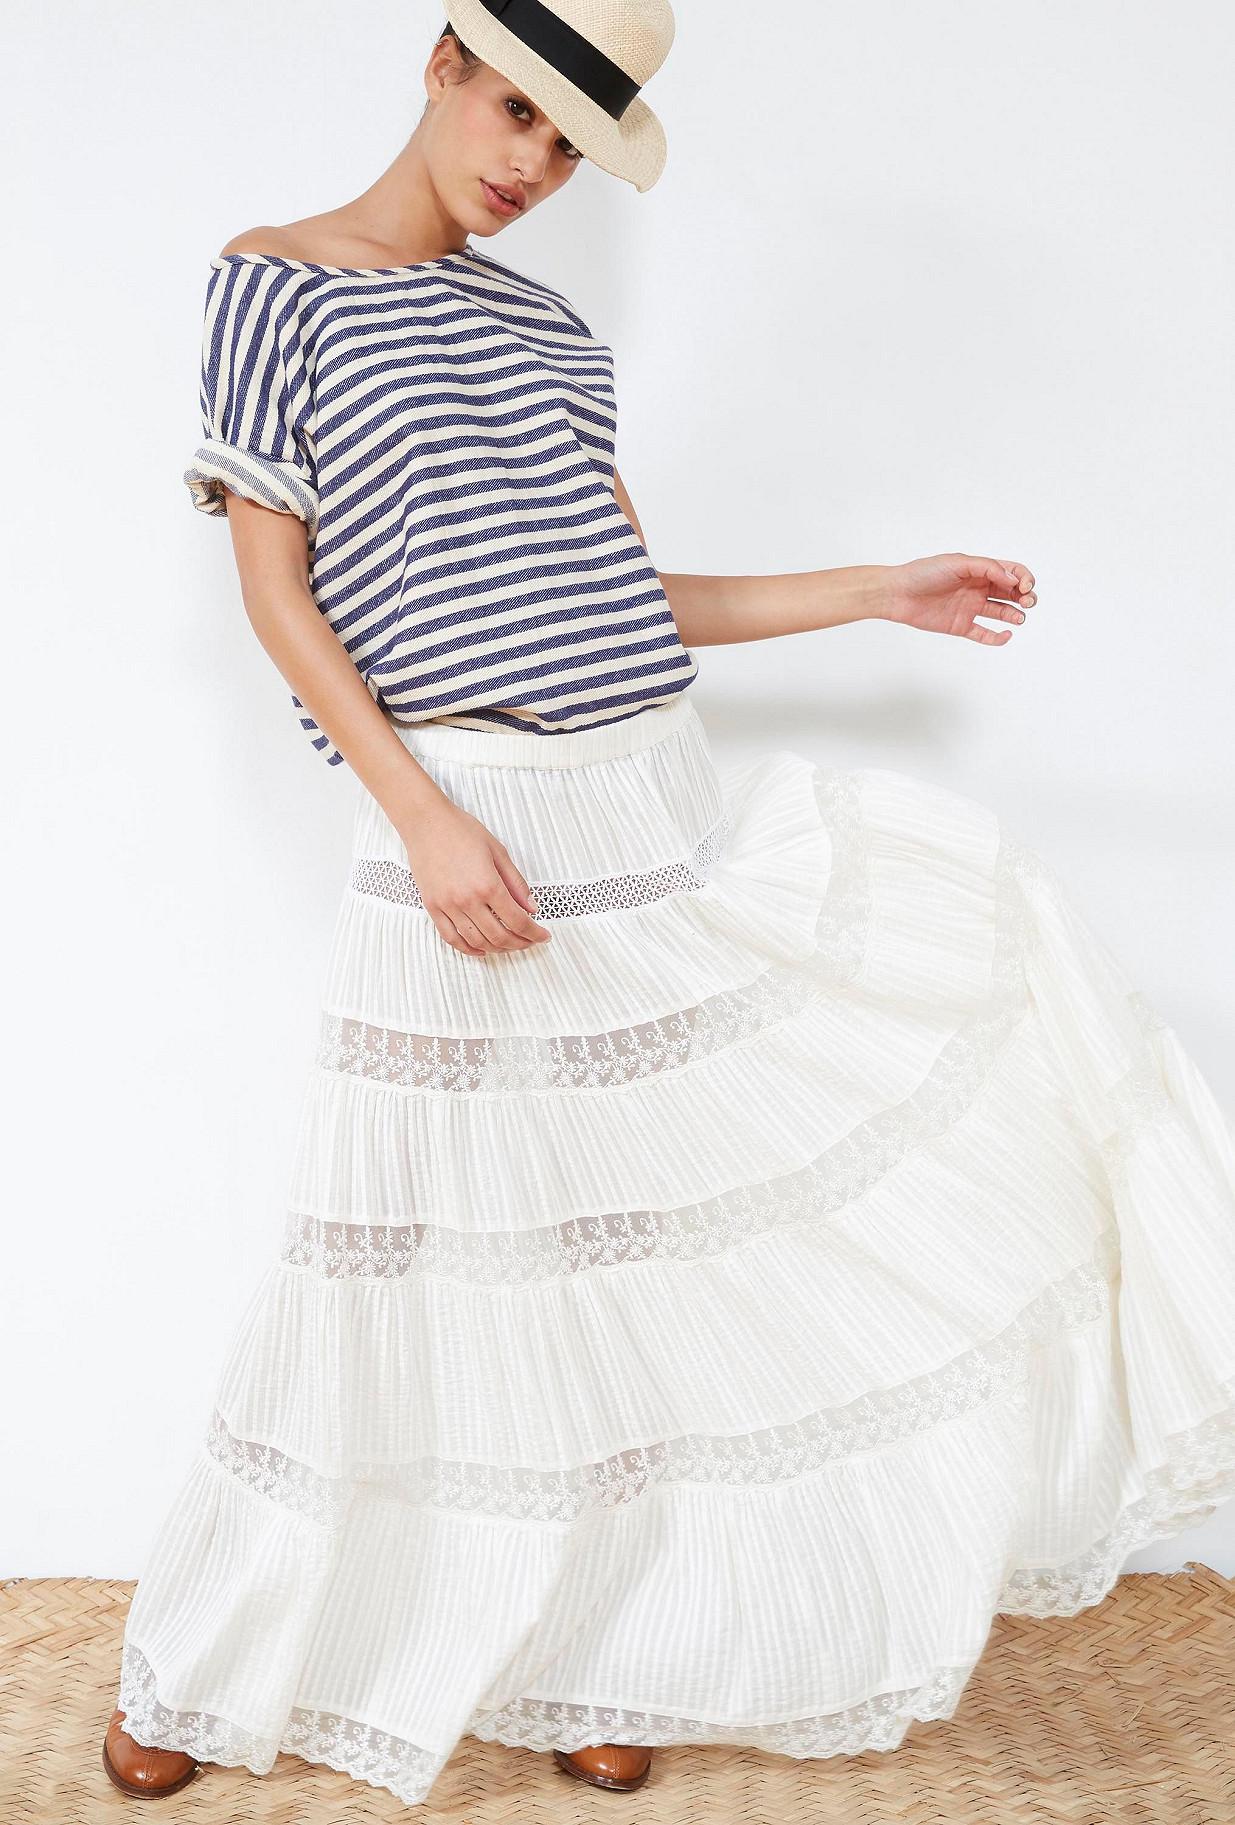 clothes store SKIRT  Havilah french designer fashion Paris